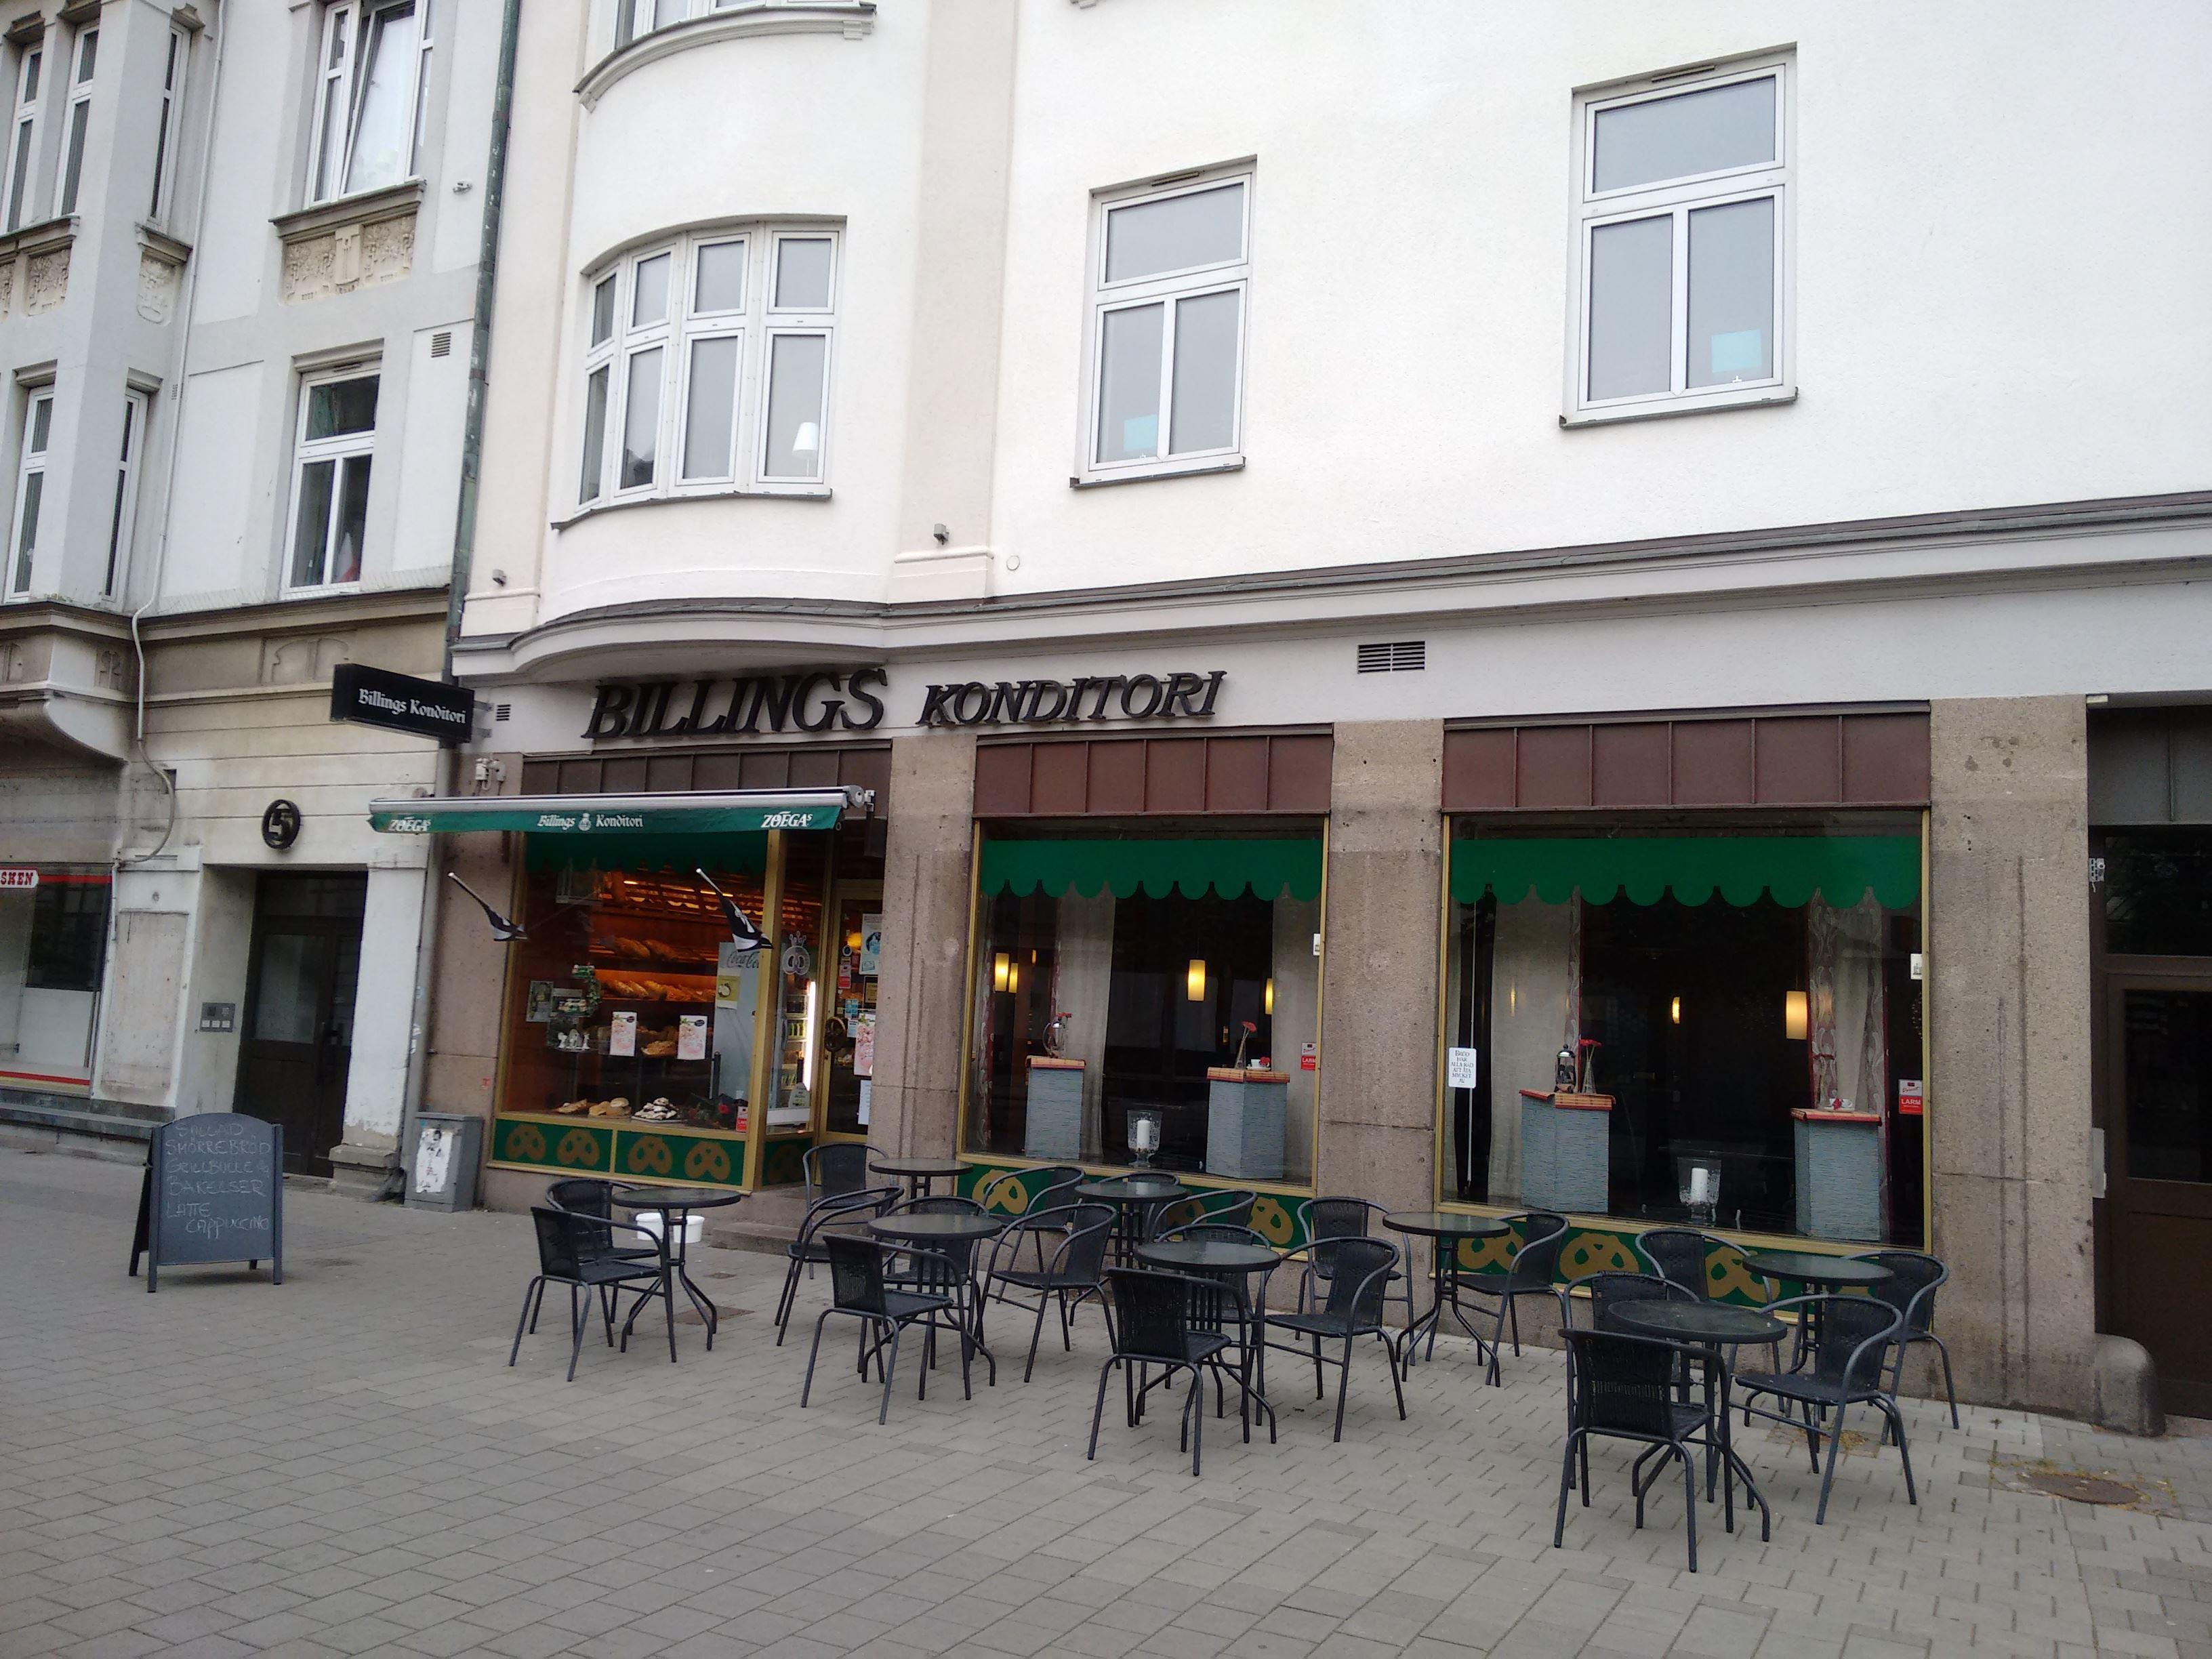 Billings pastry-shop